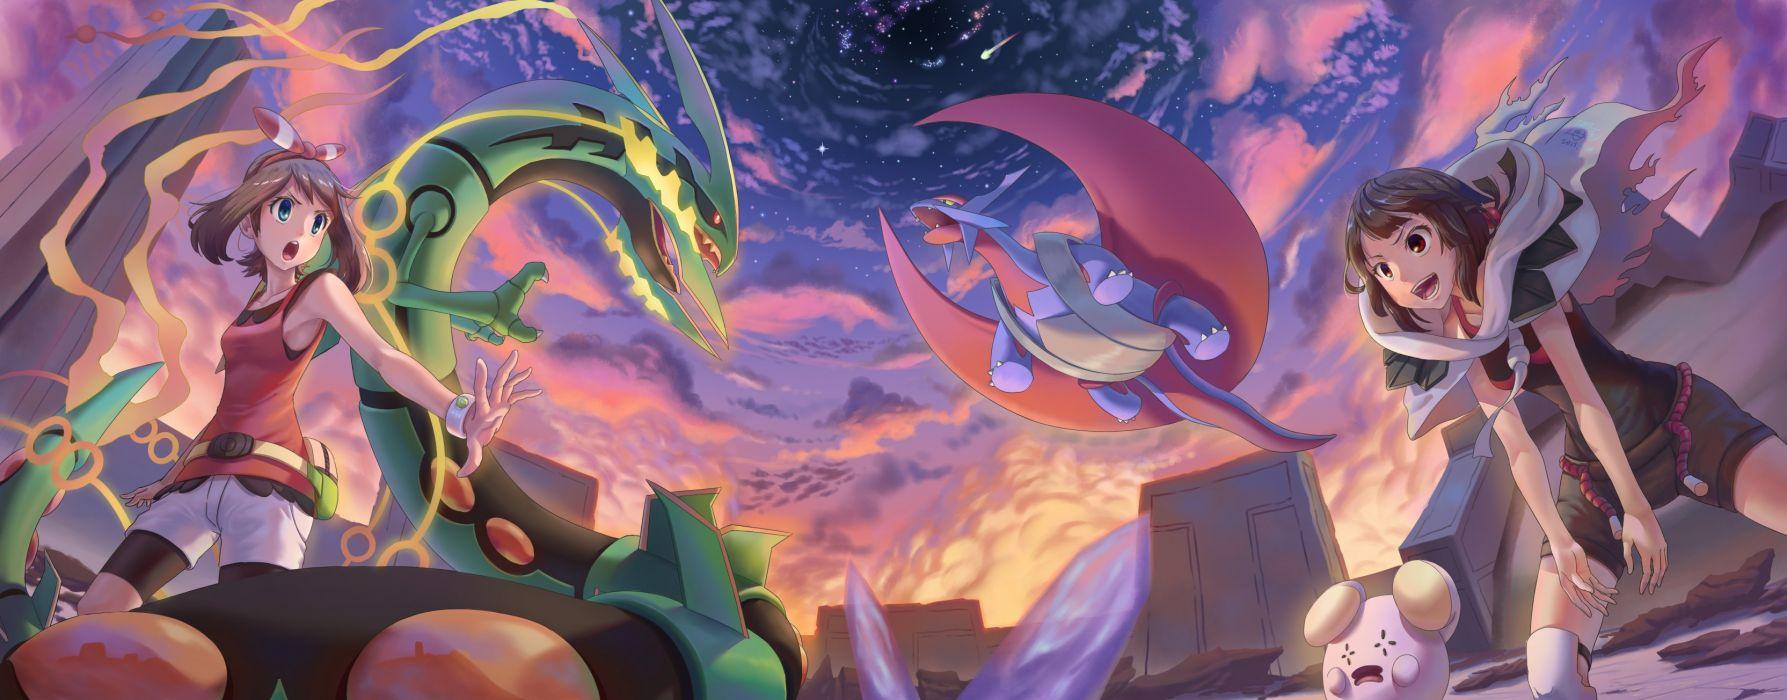 haruka pokemon mega rayquaza mega salamence pokemon tagme whismur wallpaper